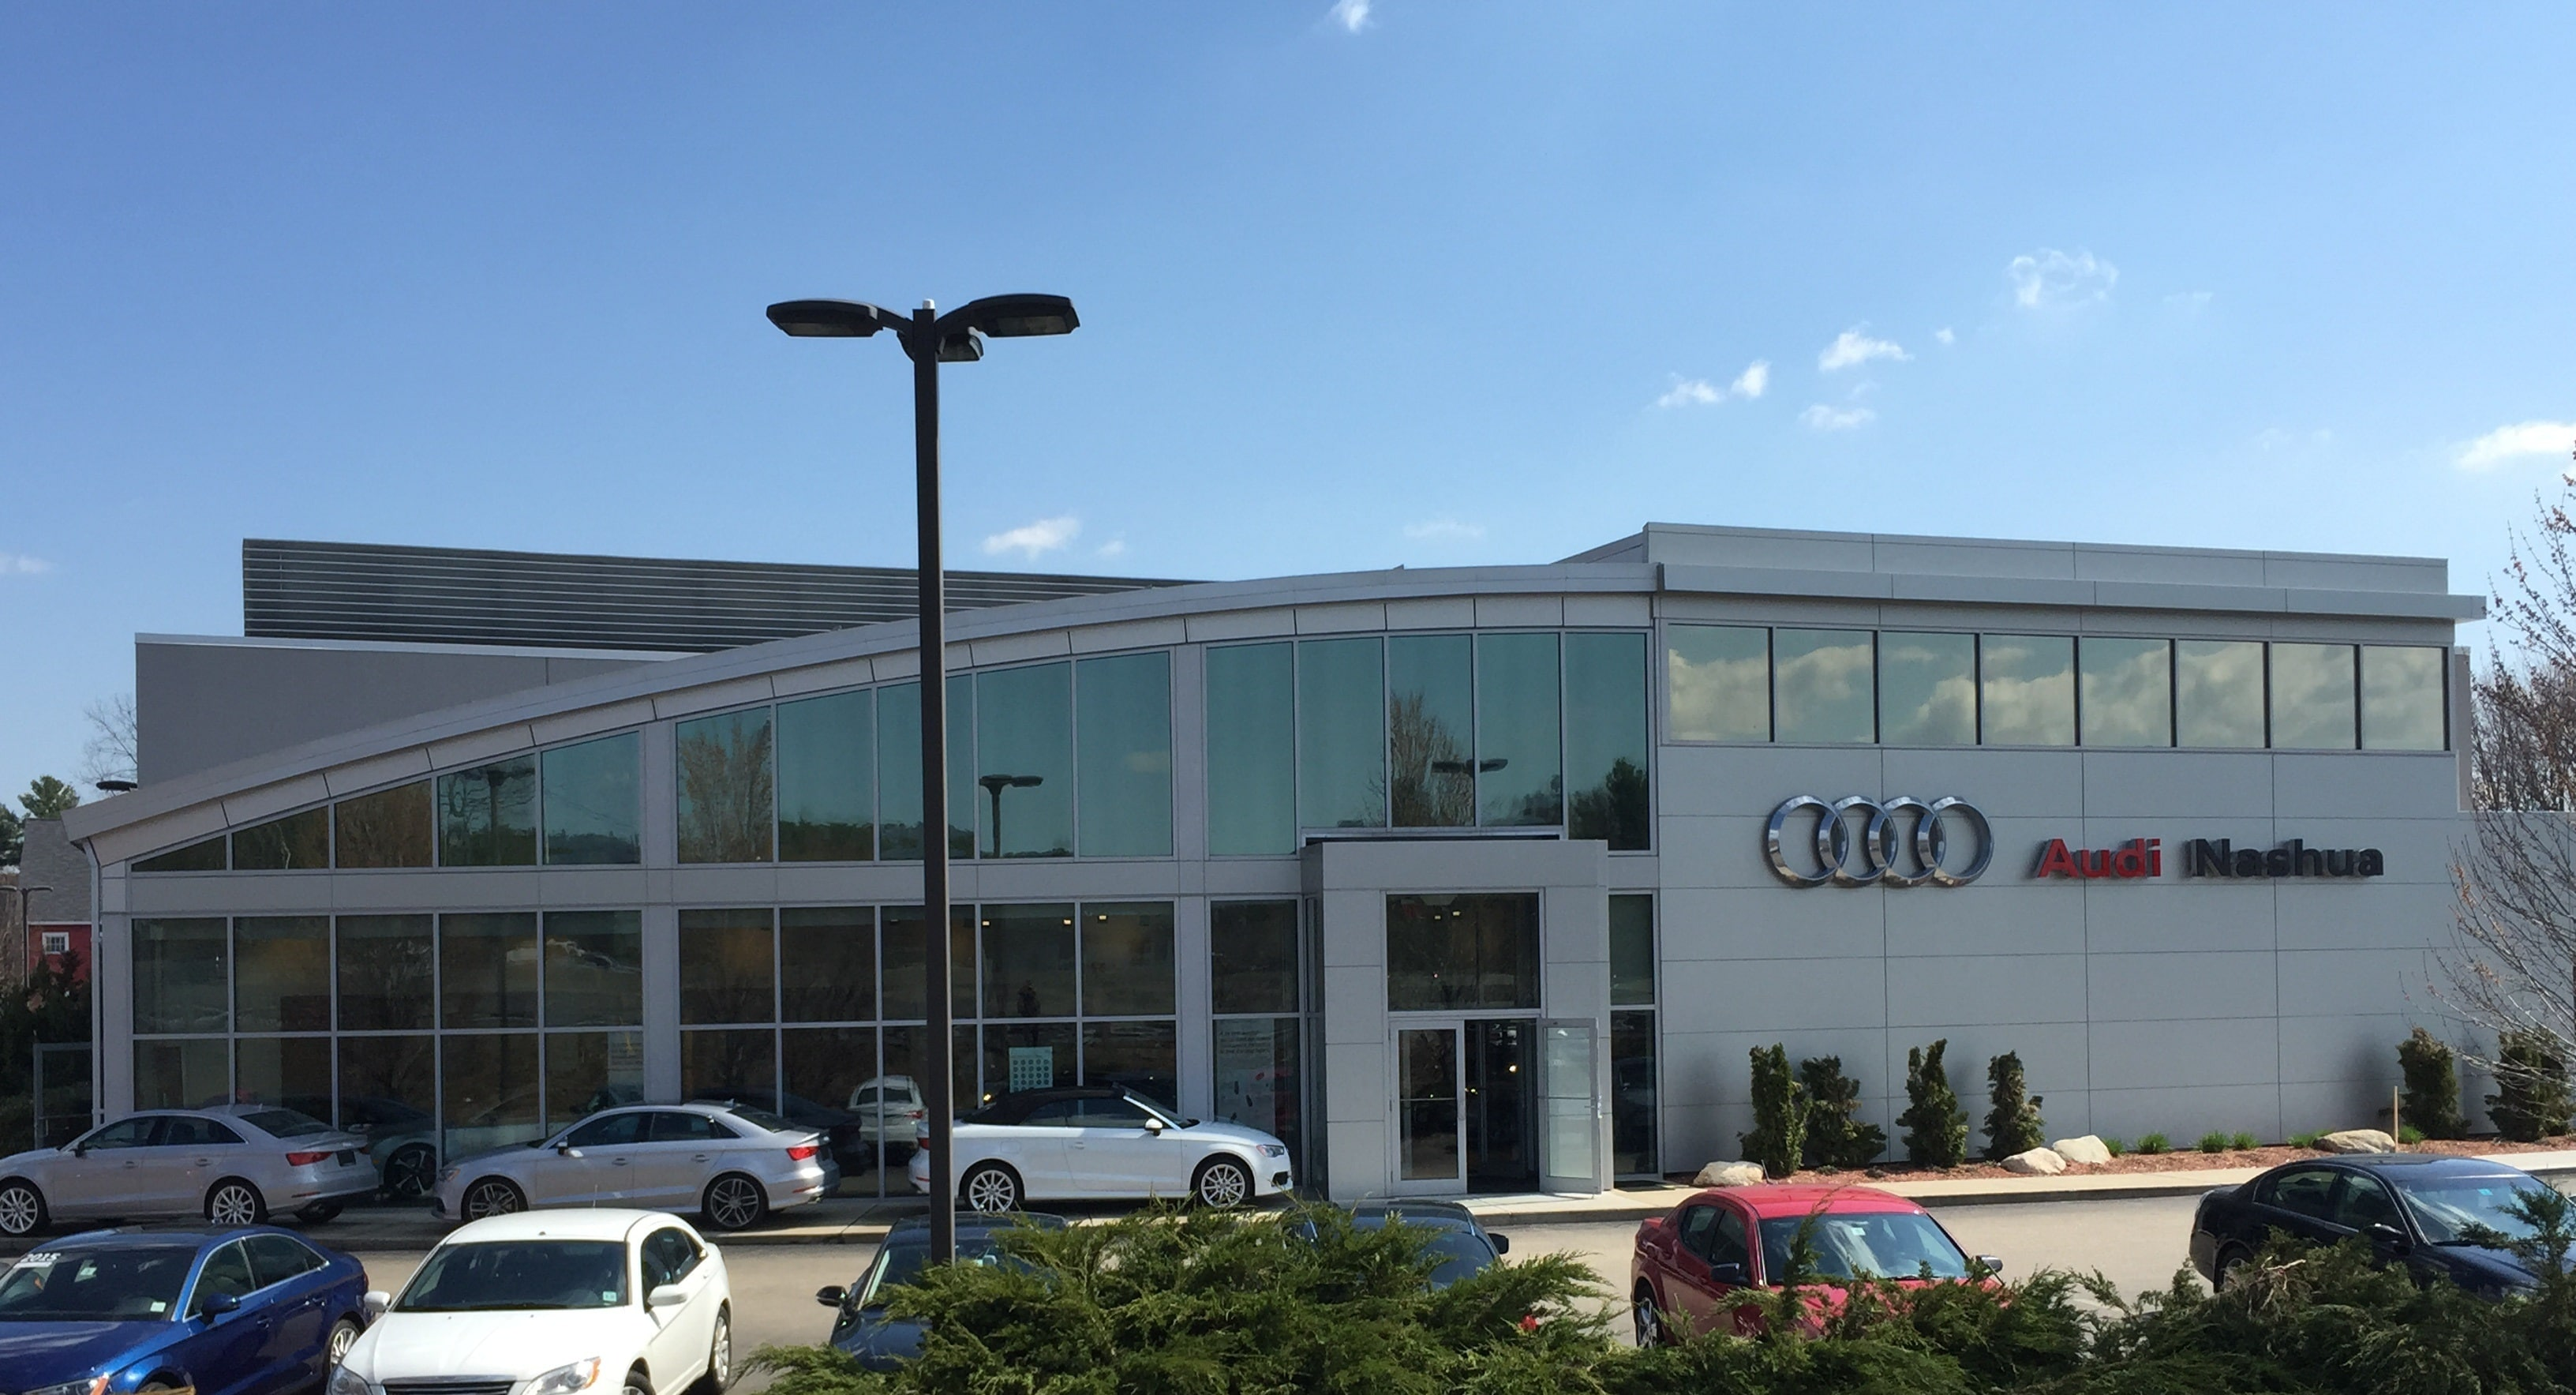 Contact Us Audi Of Nashua Oxford Audi Dealership - Audi dealerships in massachusetts